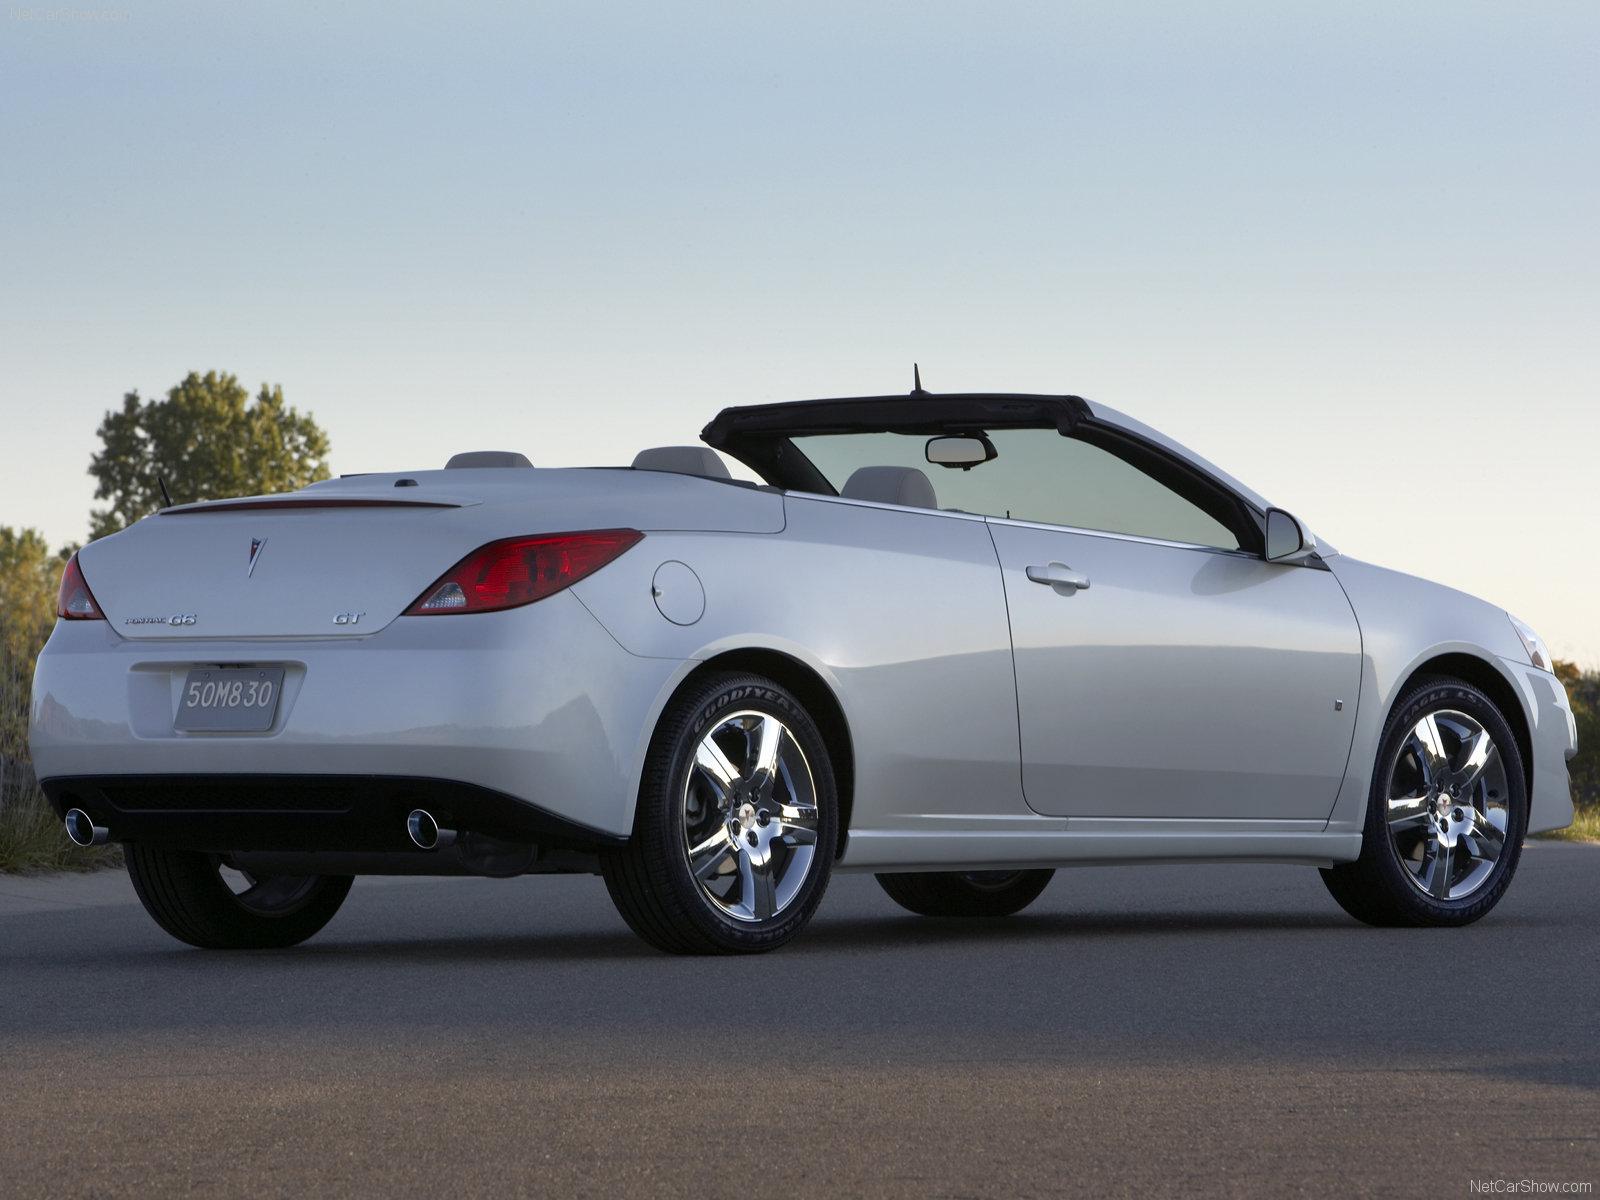 Pontiac G6 Related Images Start 0 Weili Automotive Network